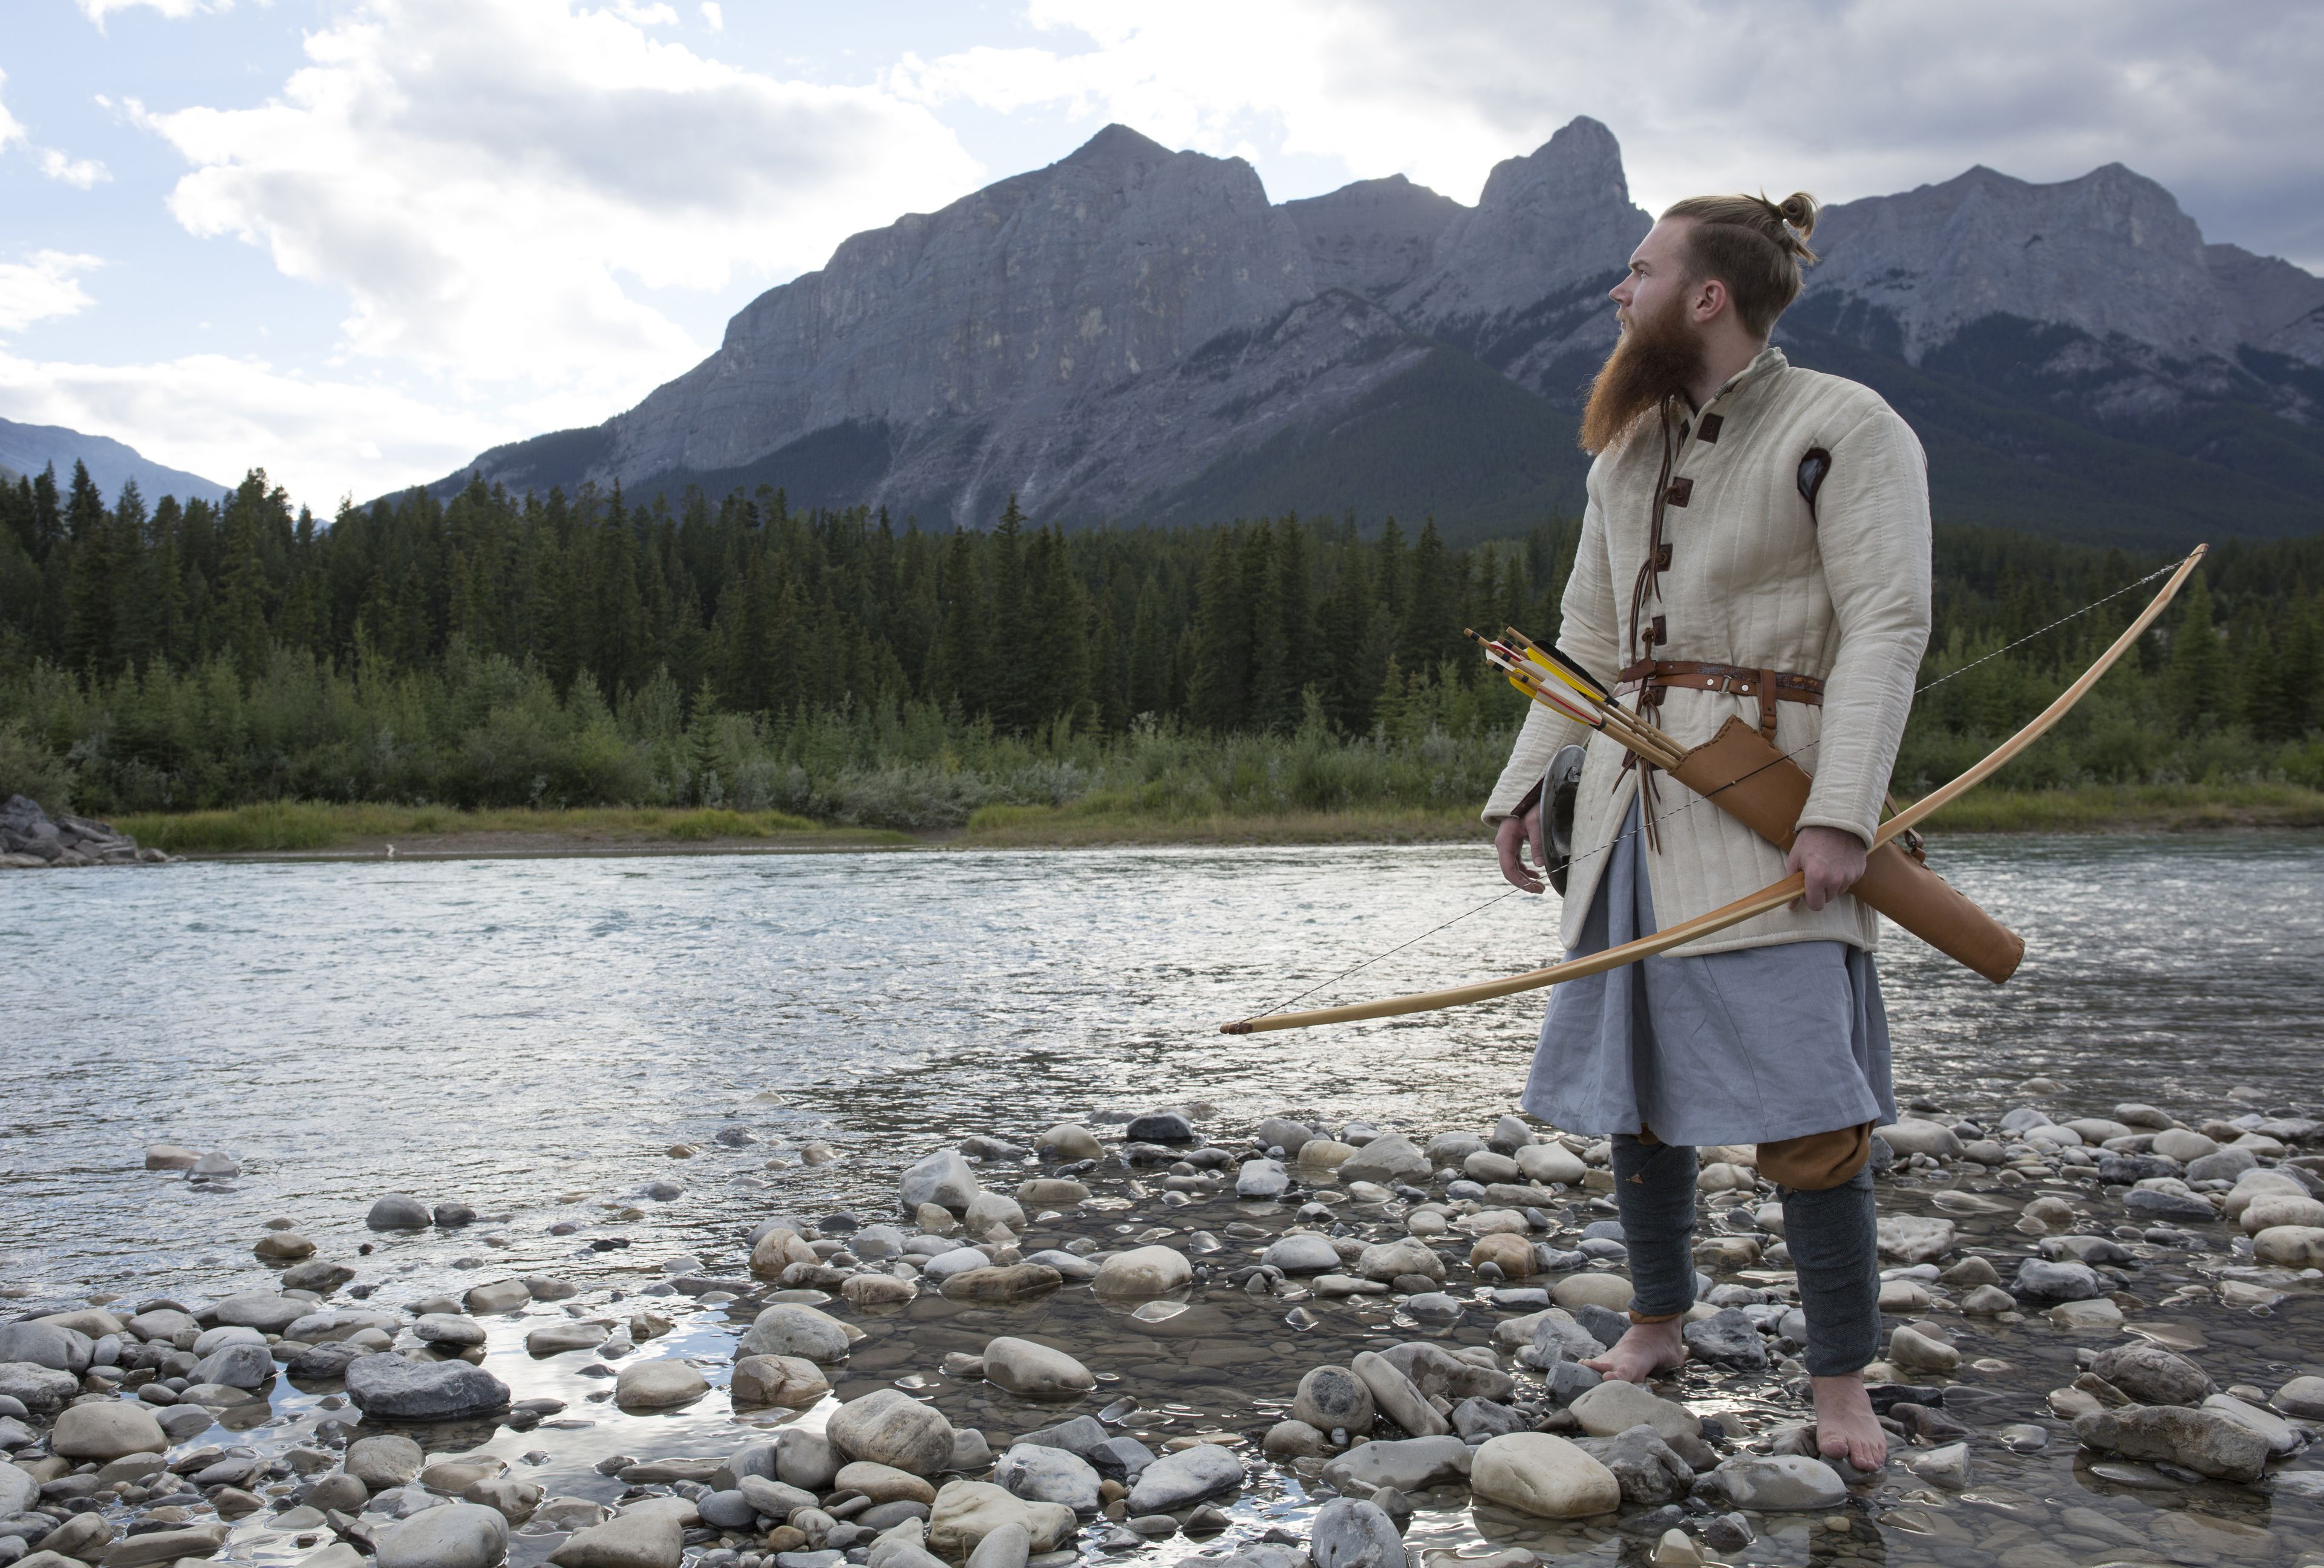 Man in viking warrior dress hunts by mtn river